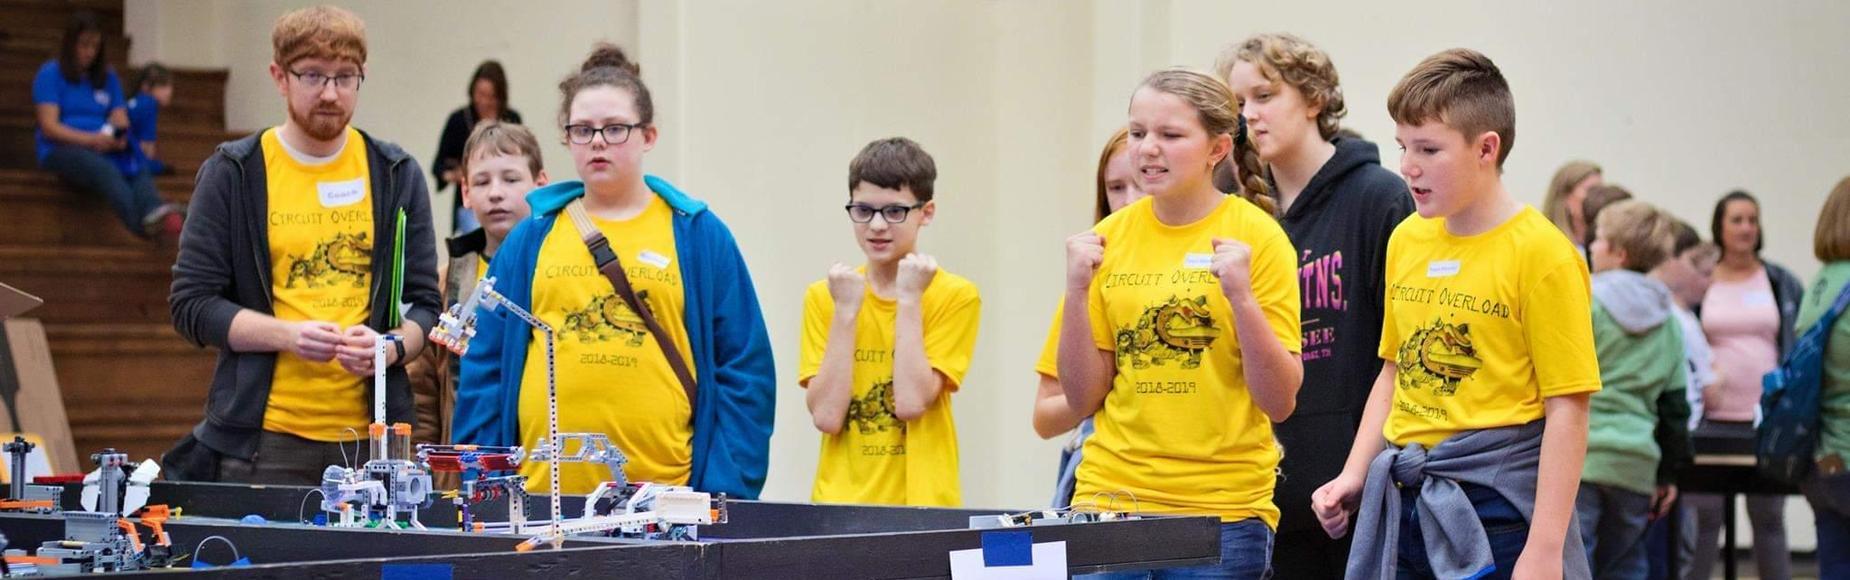 Intense-looking robotics team